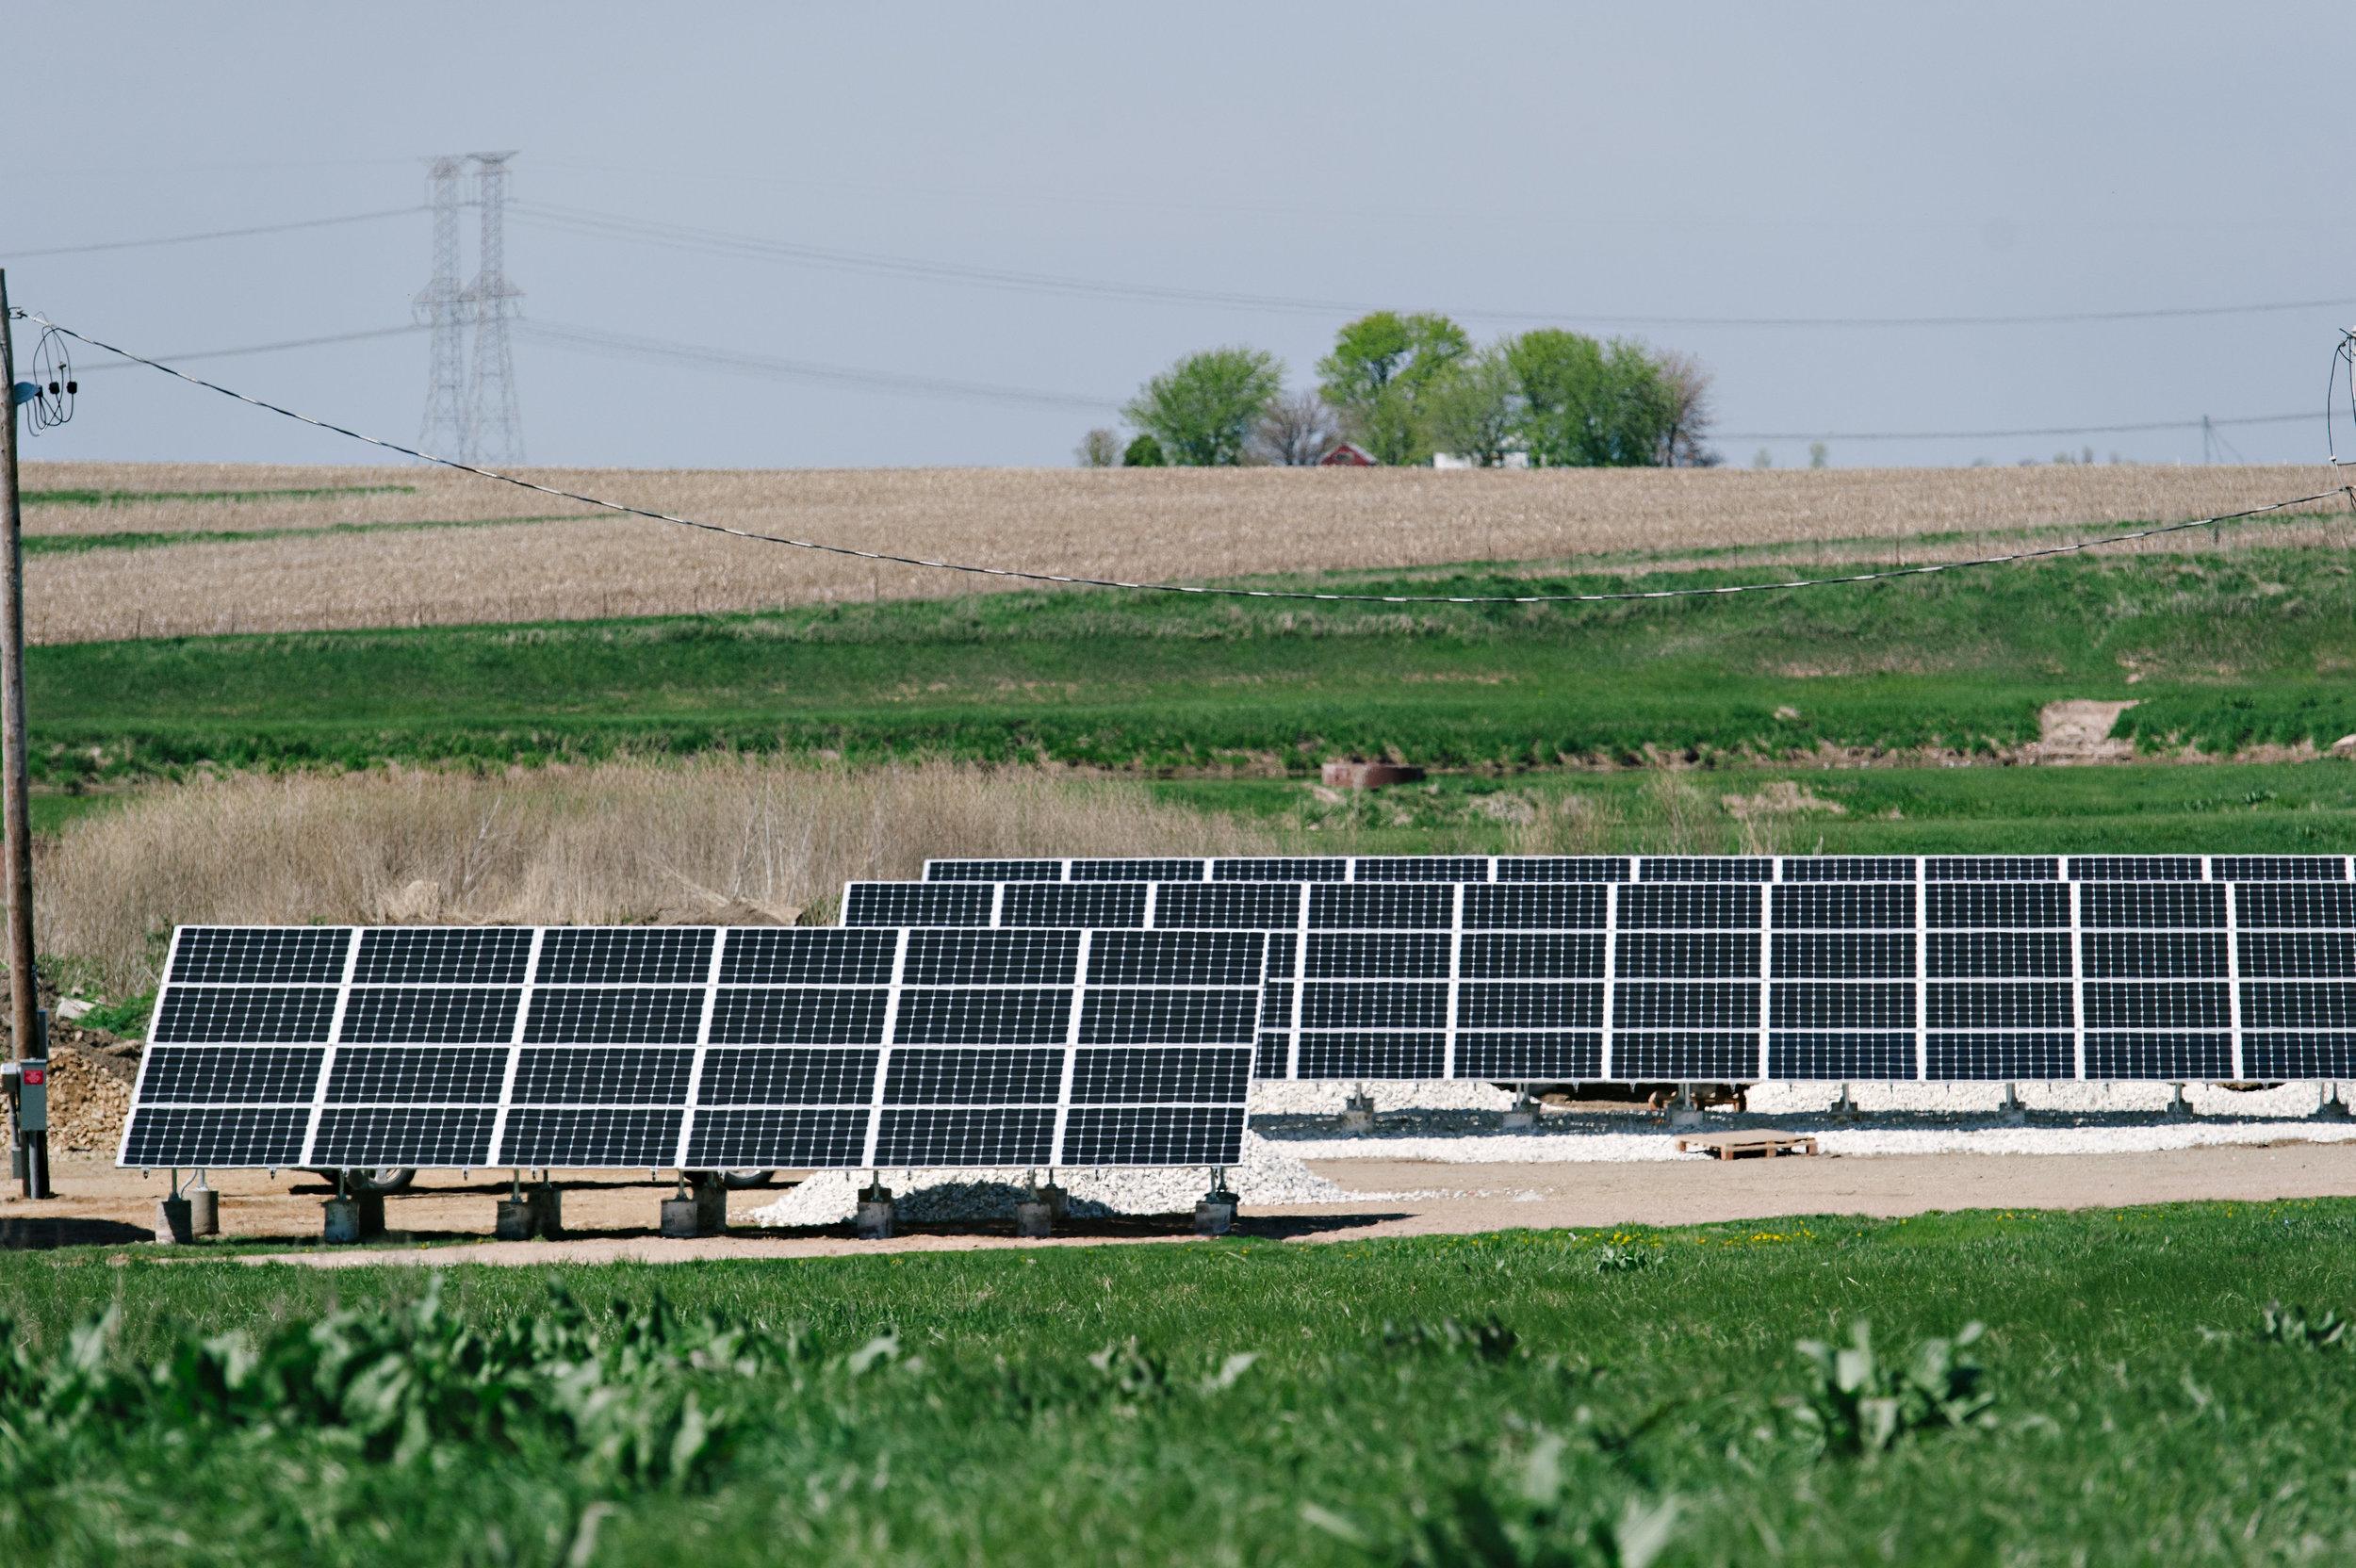 Peoria Illinois commercial solar array